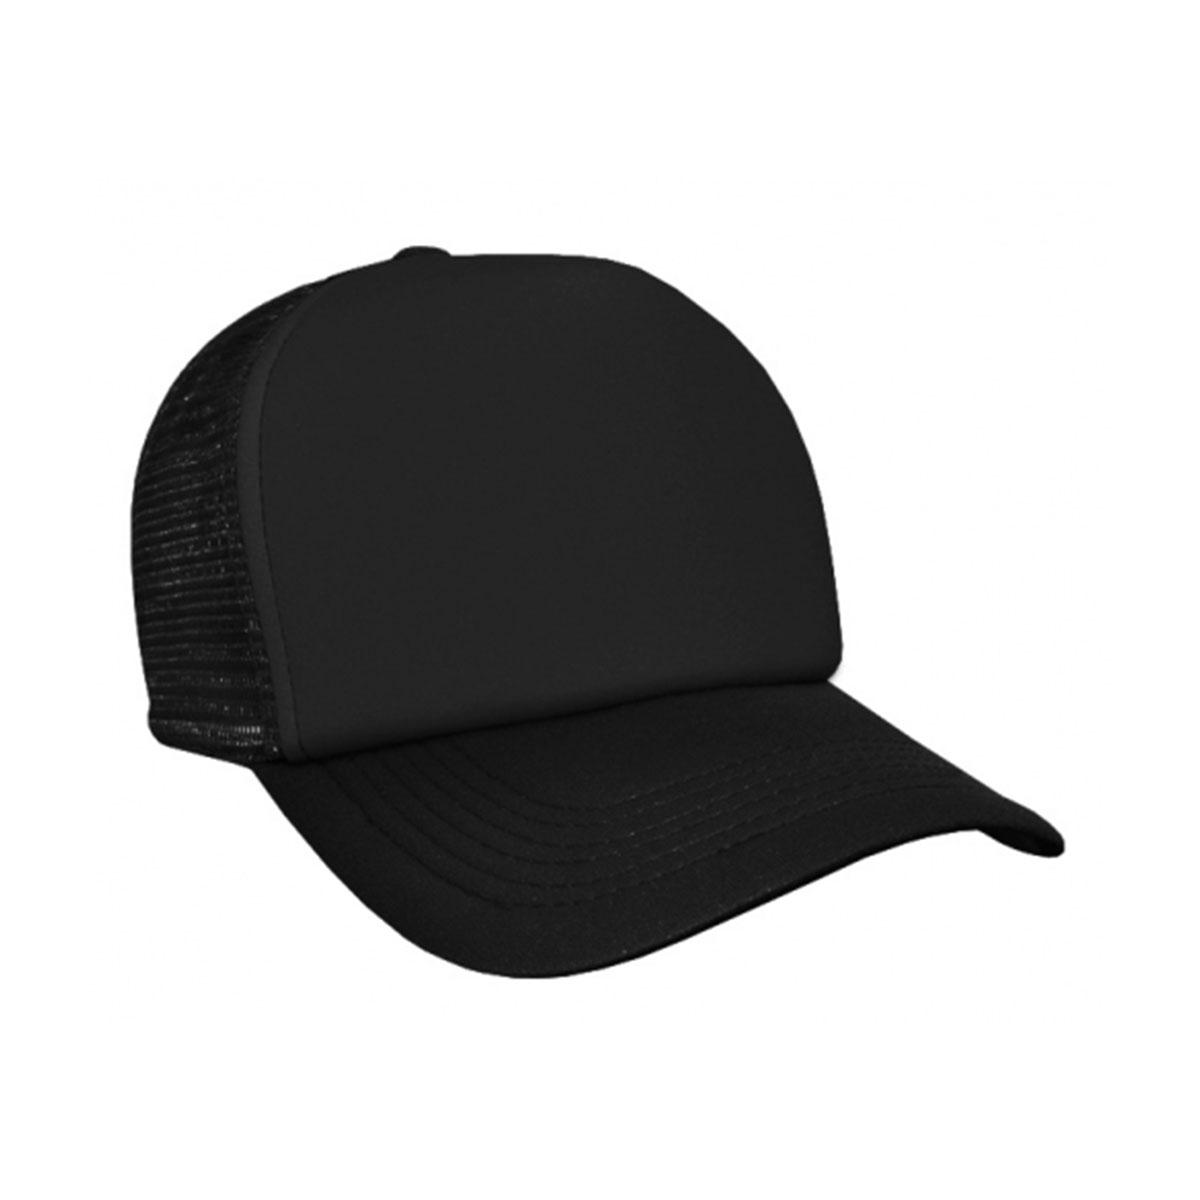 Trucker Mesh Cap-Black